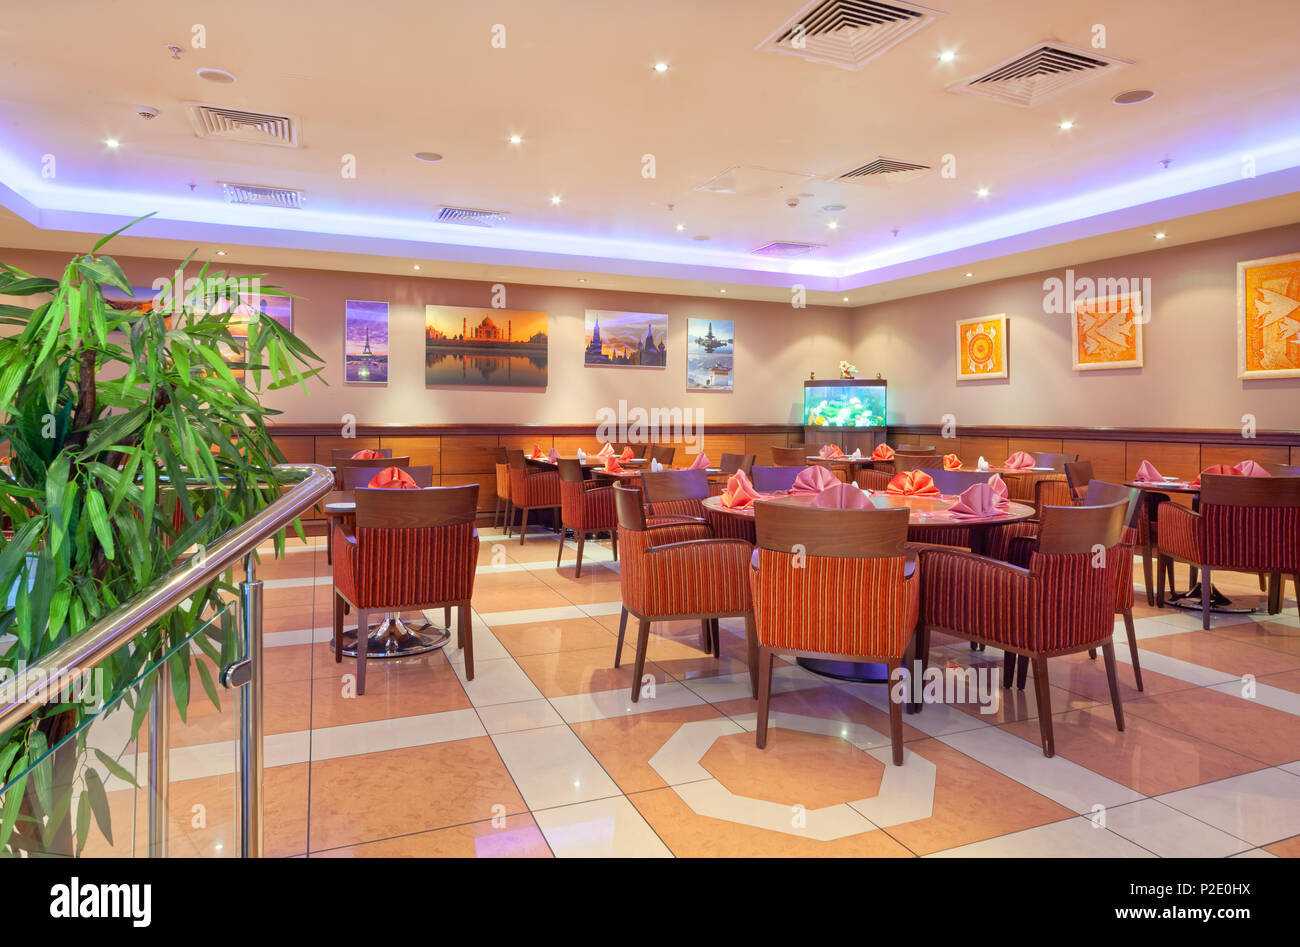 moskau september 2014 inneneinrichtung im modernen stil des bar